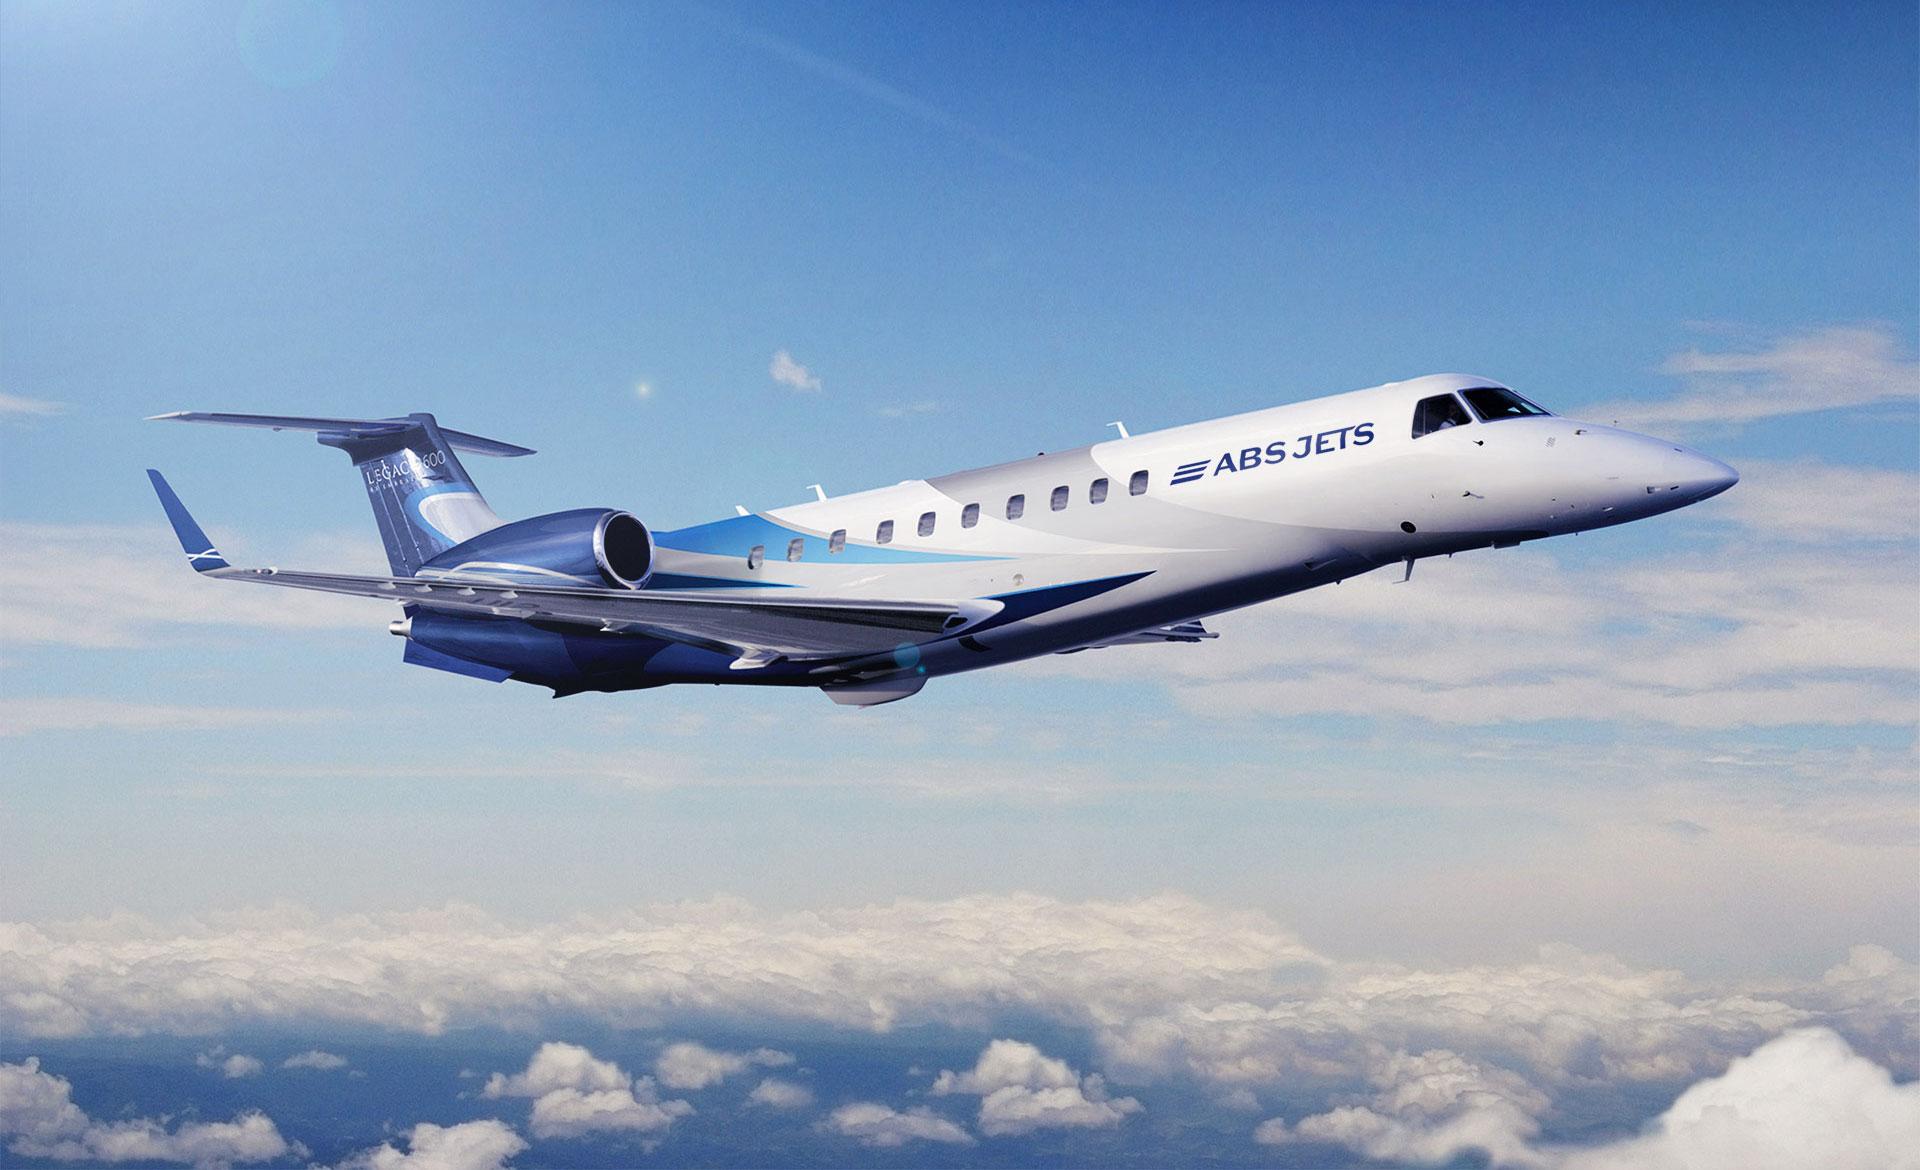 ABSJets-00-LogoAirplane